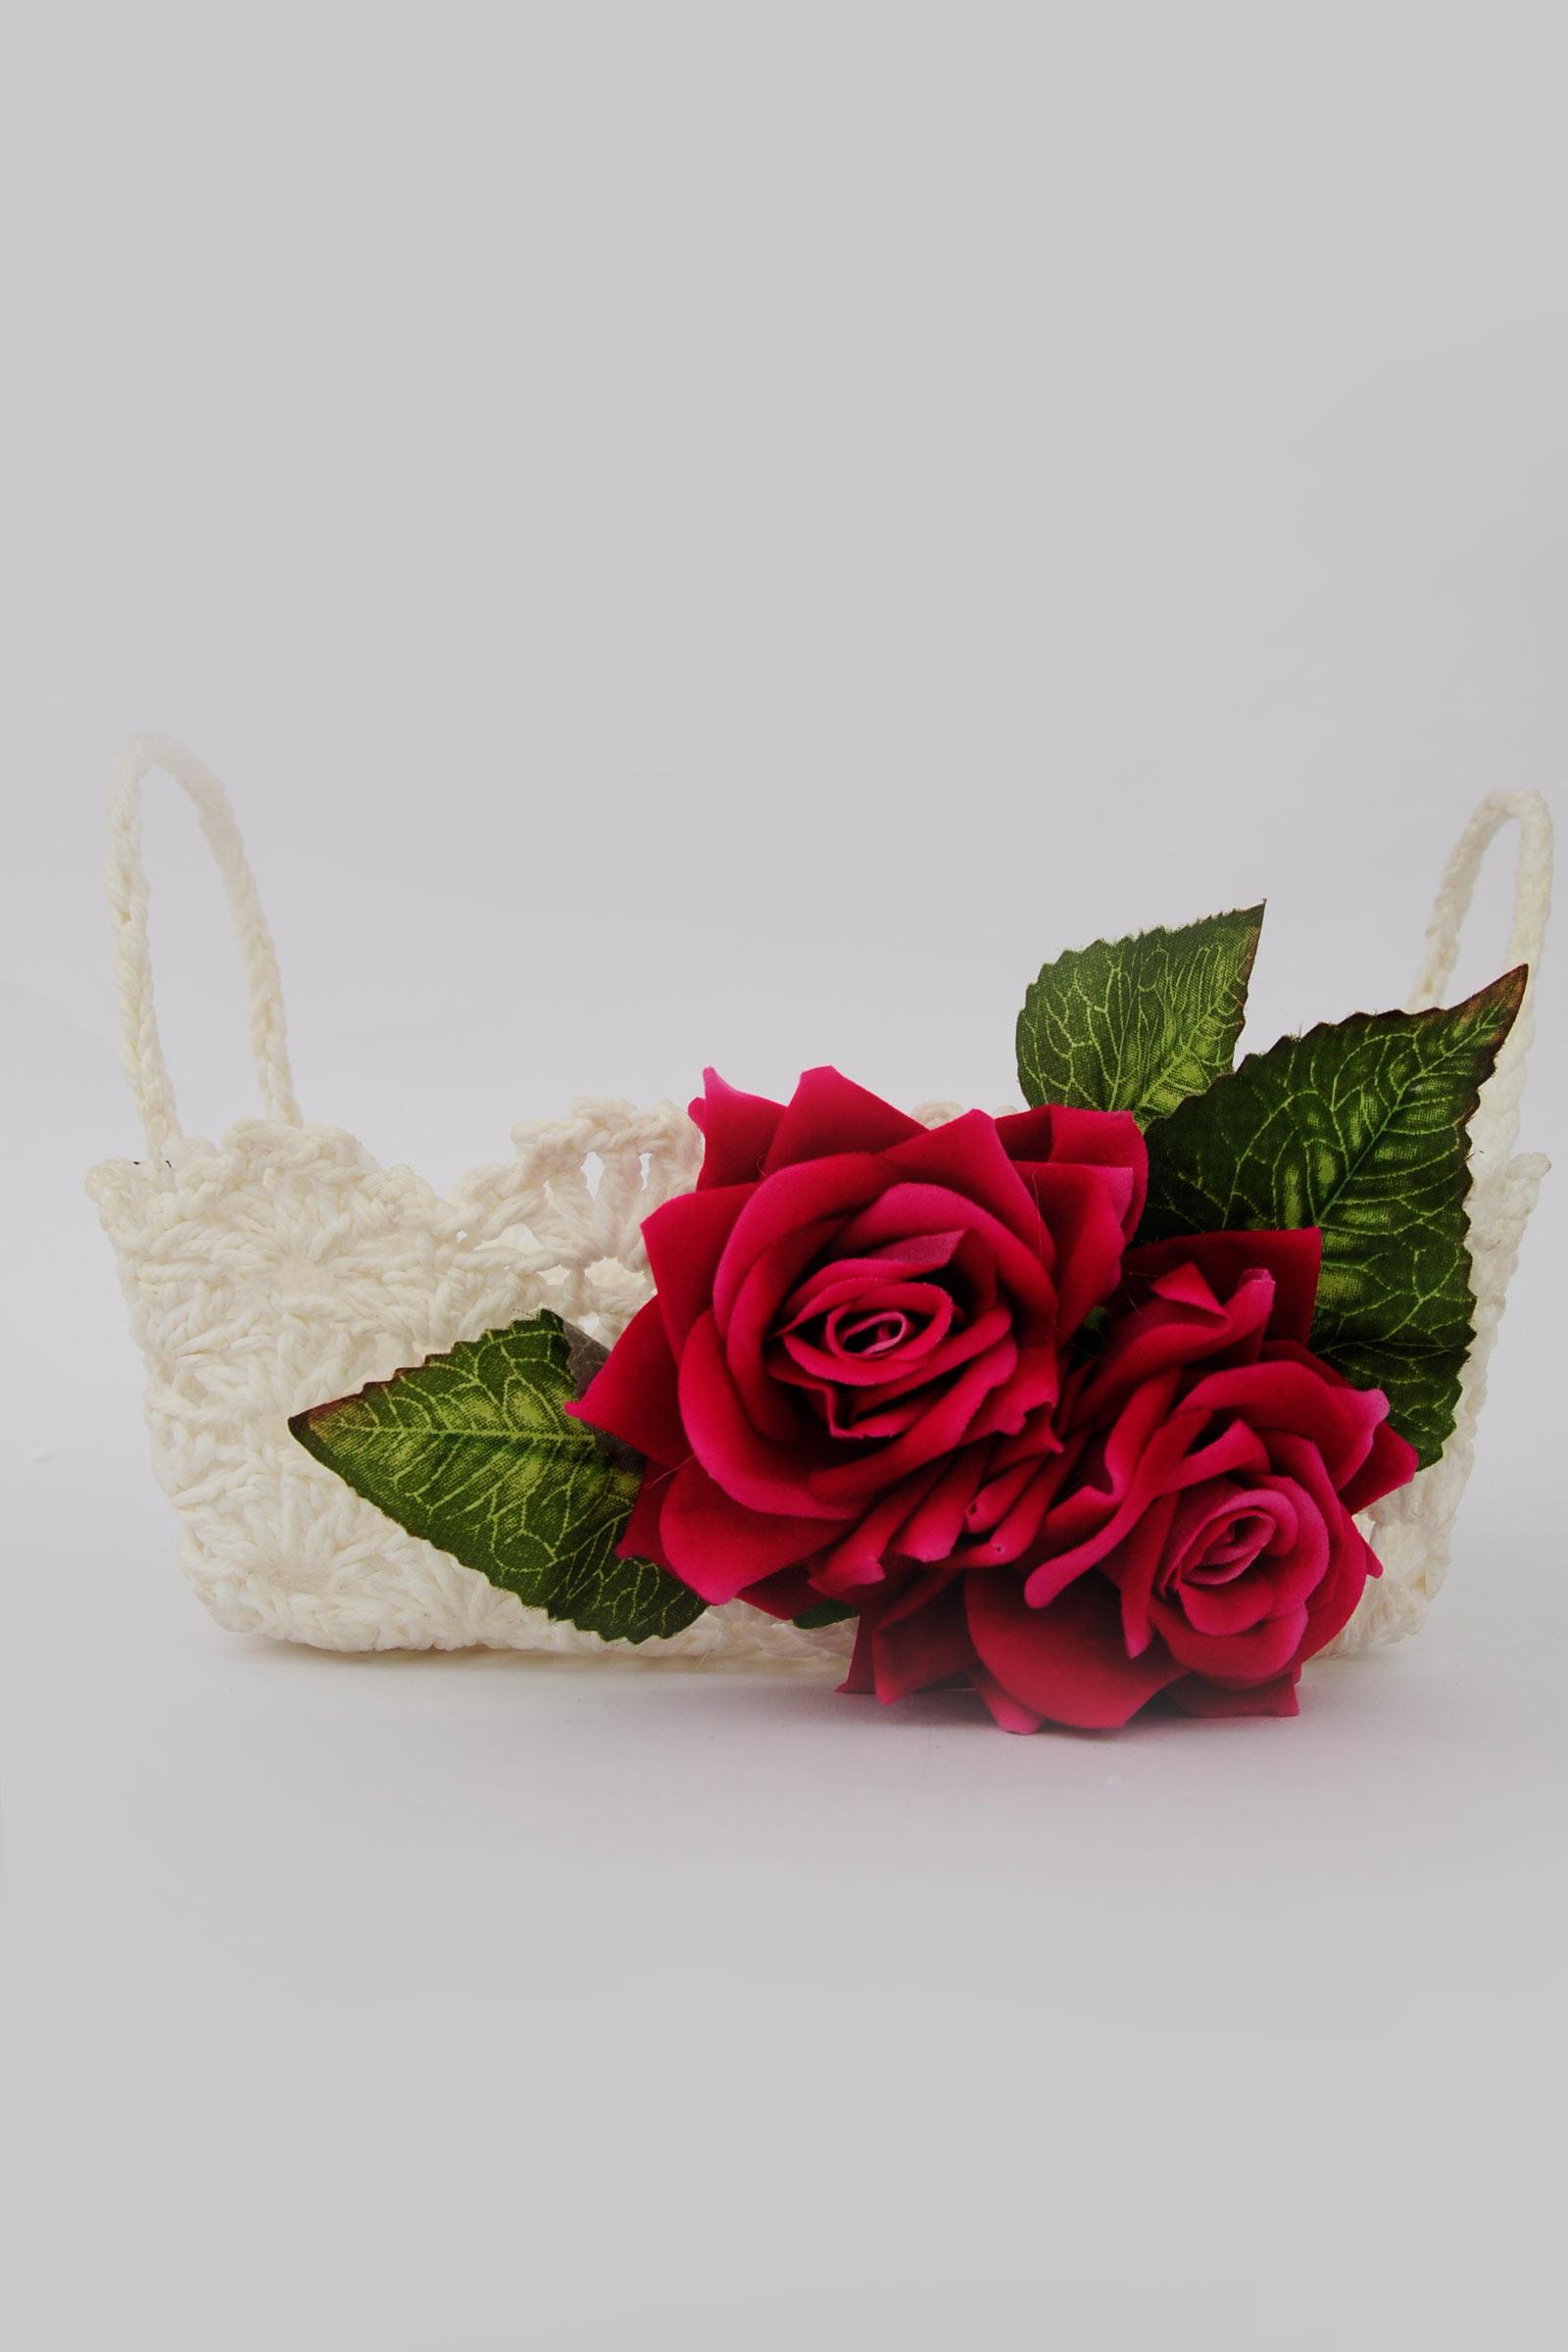 Rose mini basket